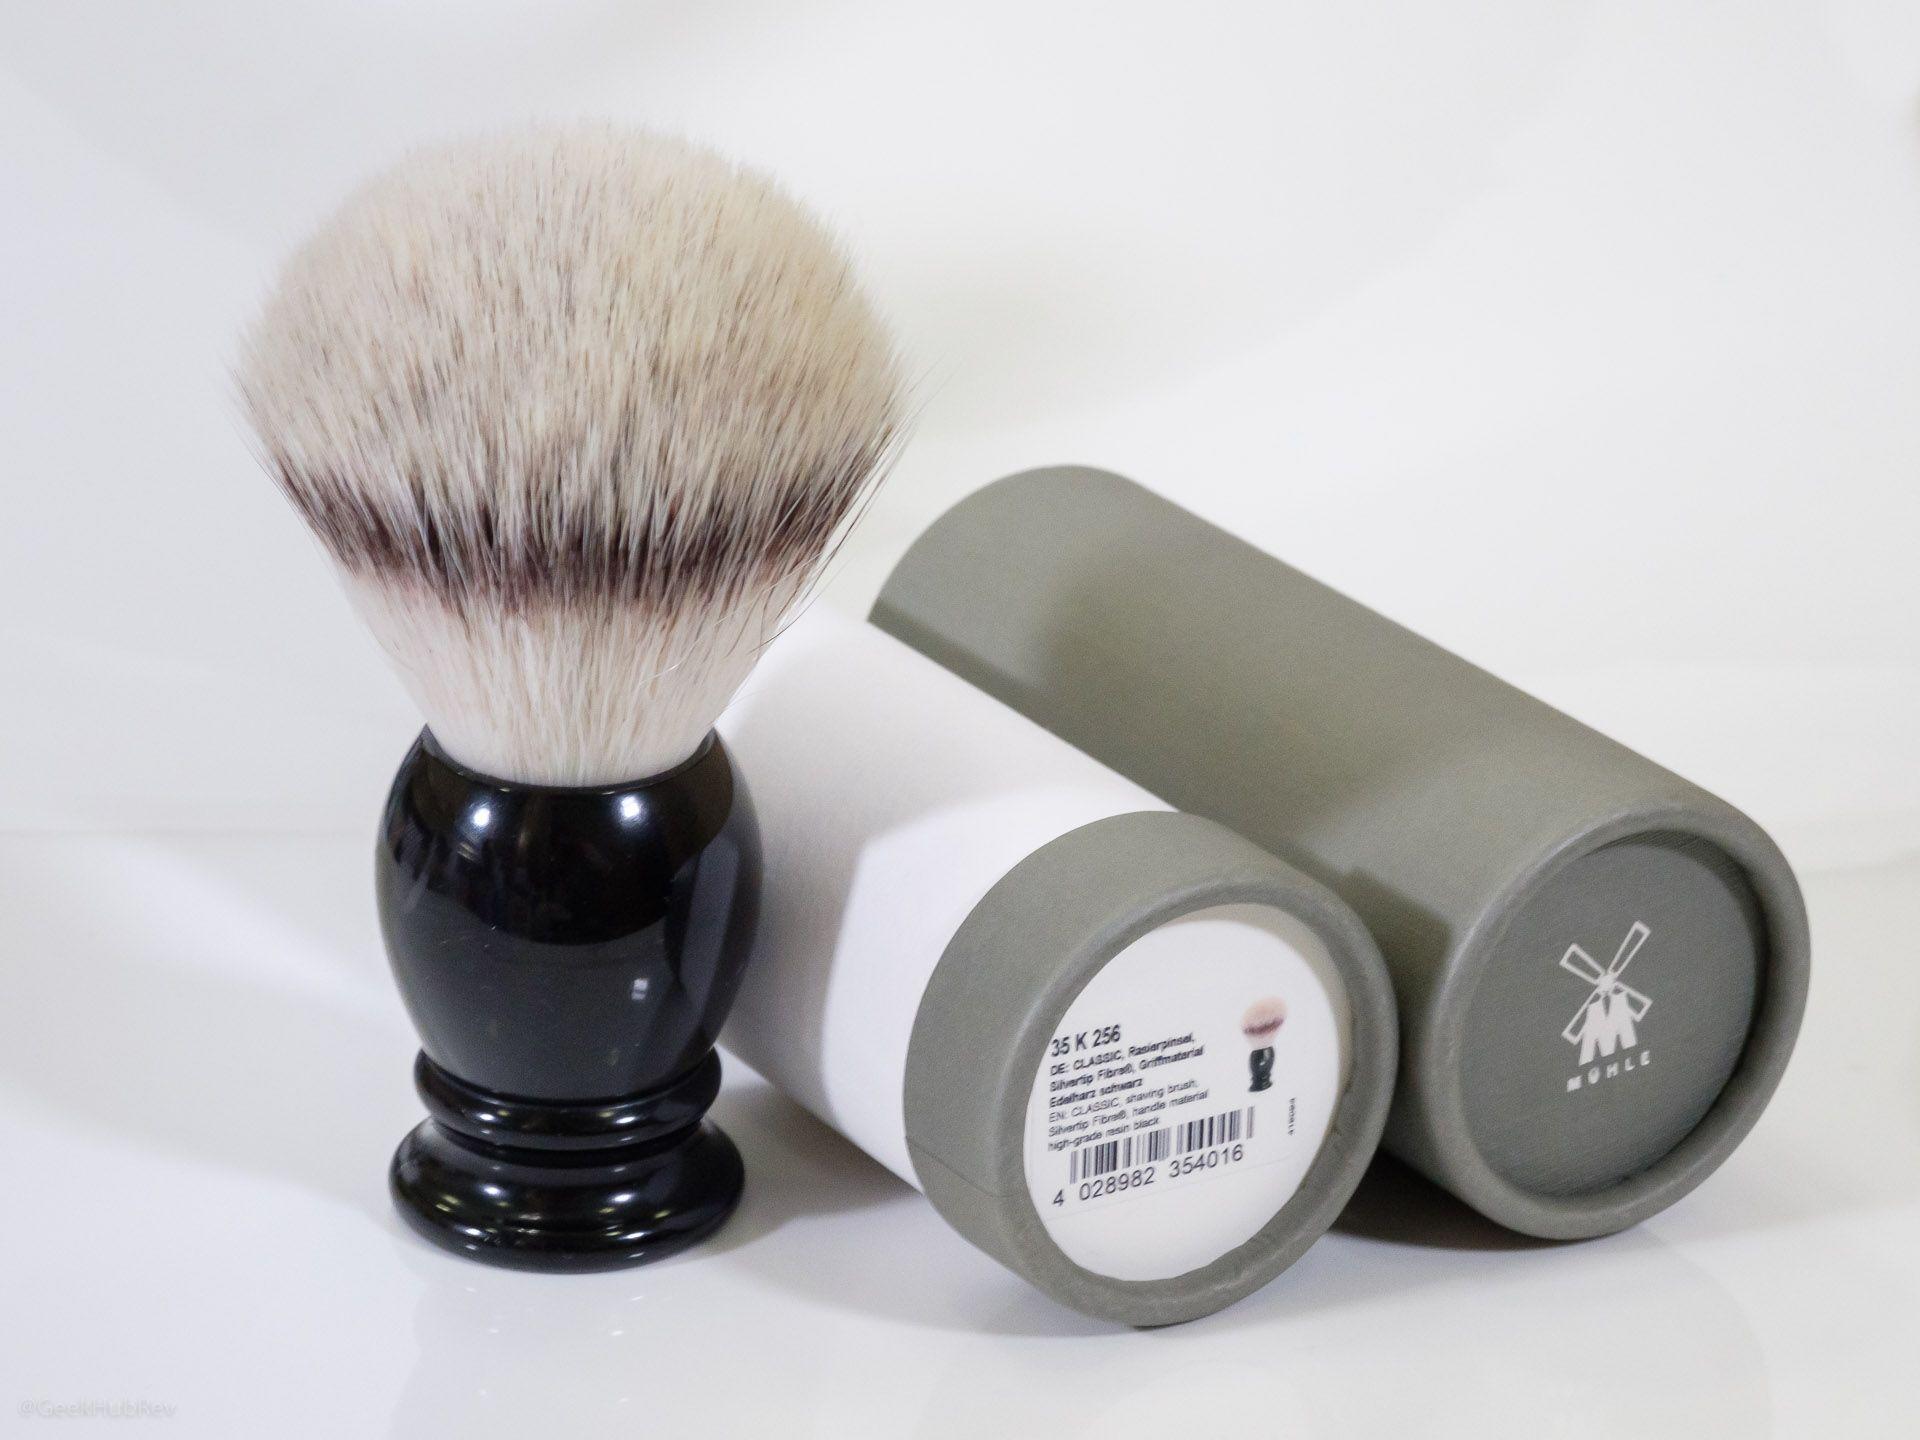 Opakowanie pędzla Mühle Classic 35K256 Silvertip Fibres Synthetic Brush